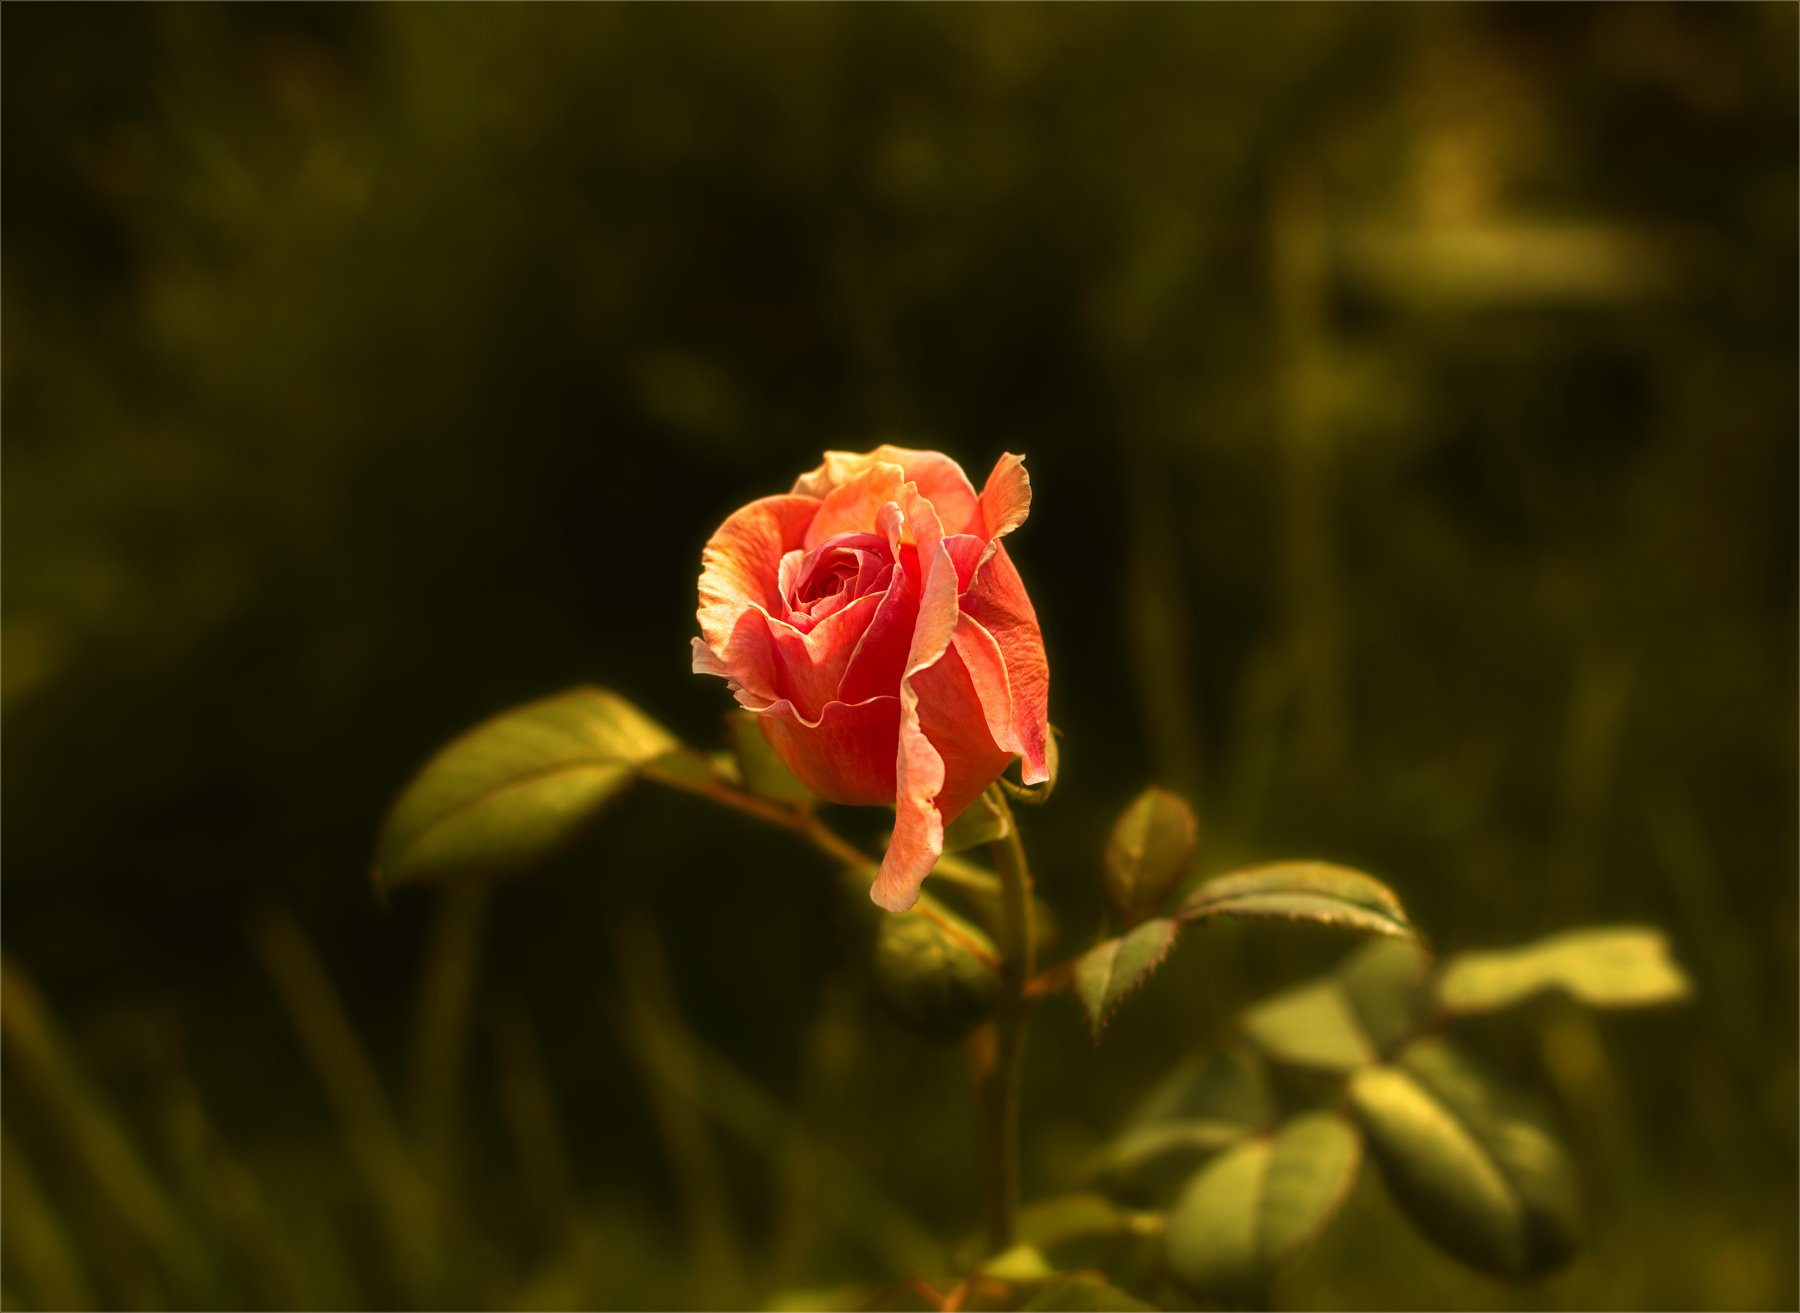 nature, природа,  цветы, роза, минимализм, растение, Михаил MSH